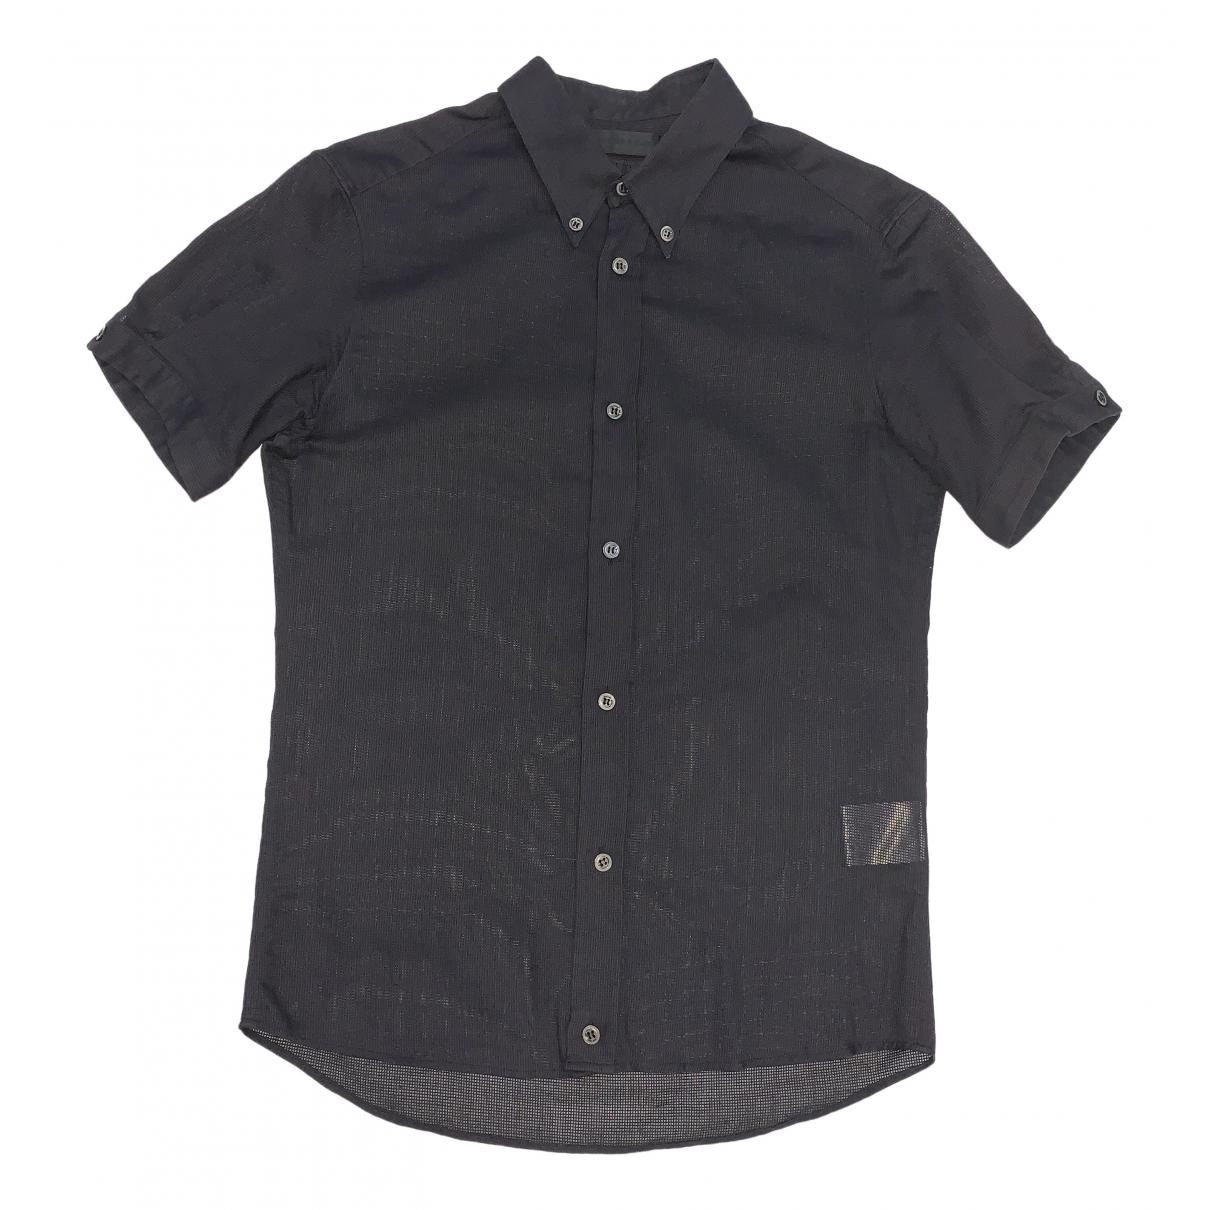 Alexander Mcqueen \N Black Cotton Shirts for Men XS International